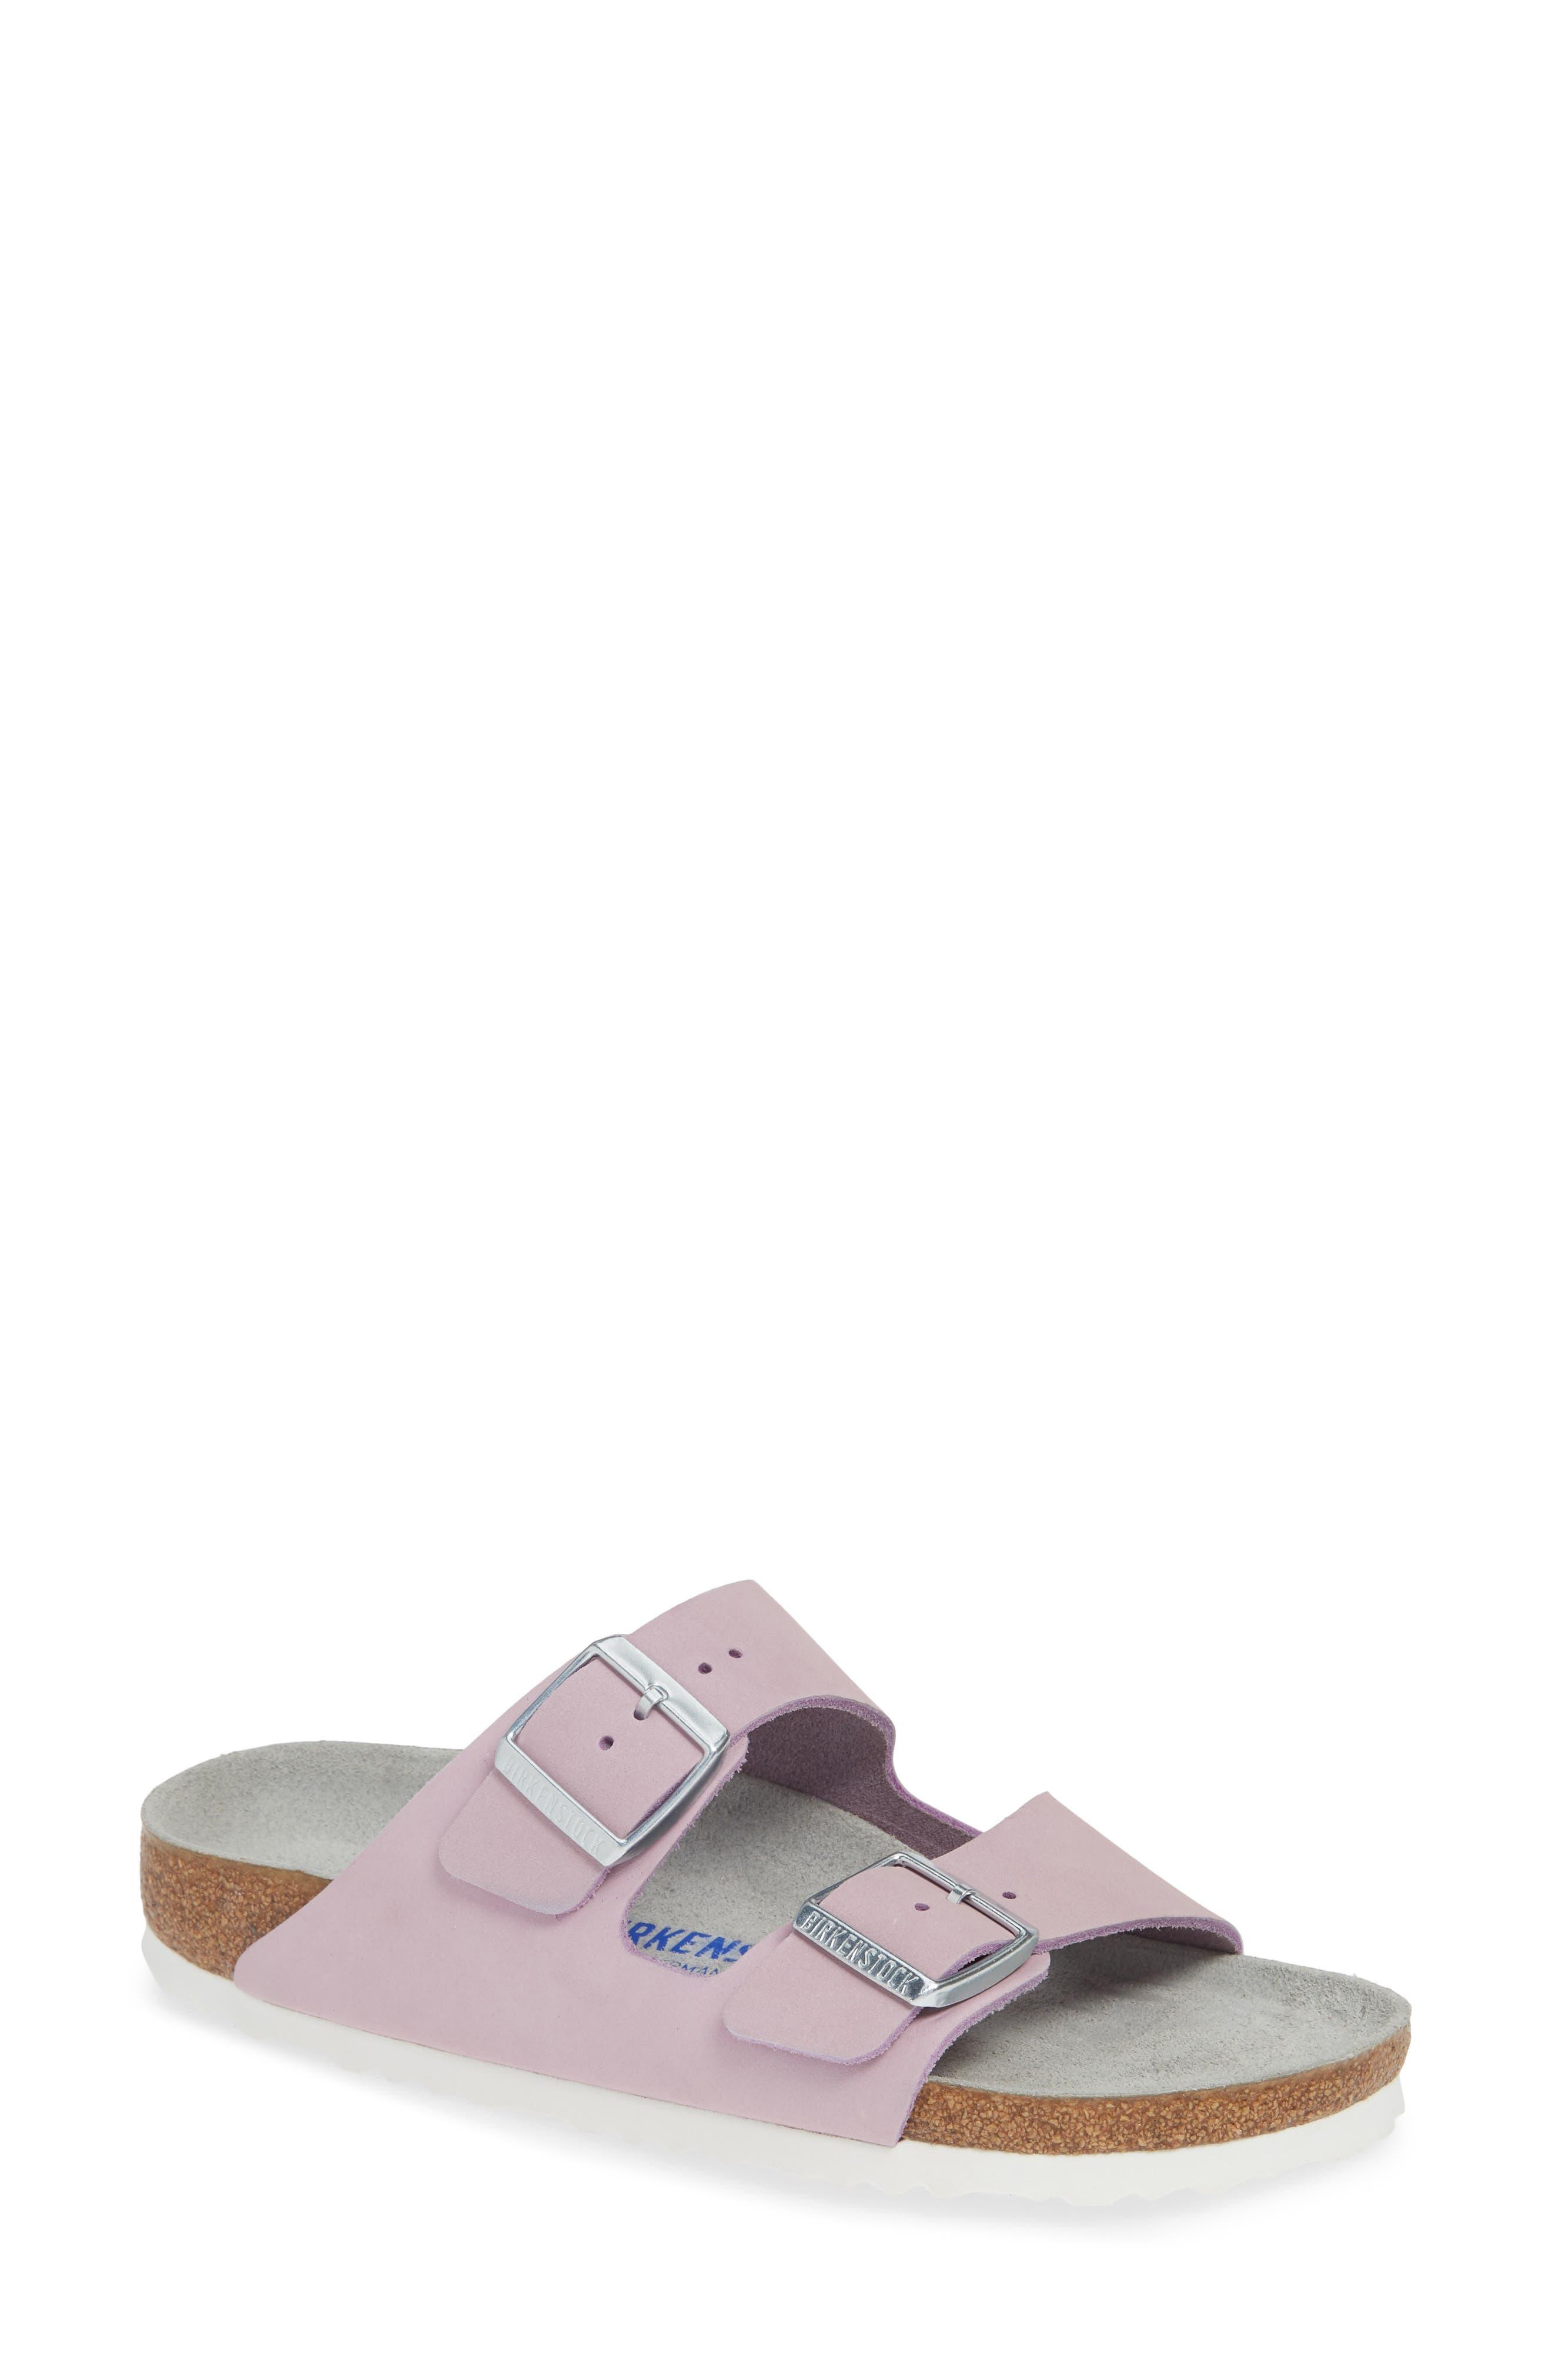 BIRKENSTOCK, Arizona Soft Footbed Sandal, Main thumbnail 1, color, LILAC NUBUCK